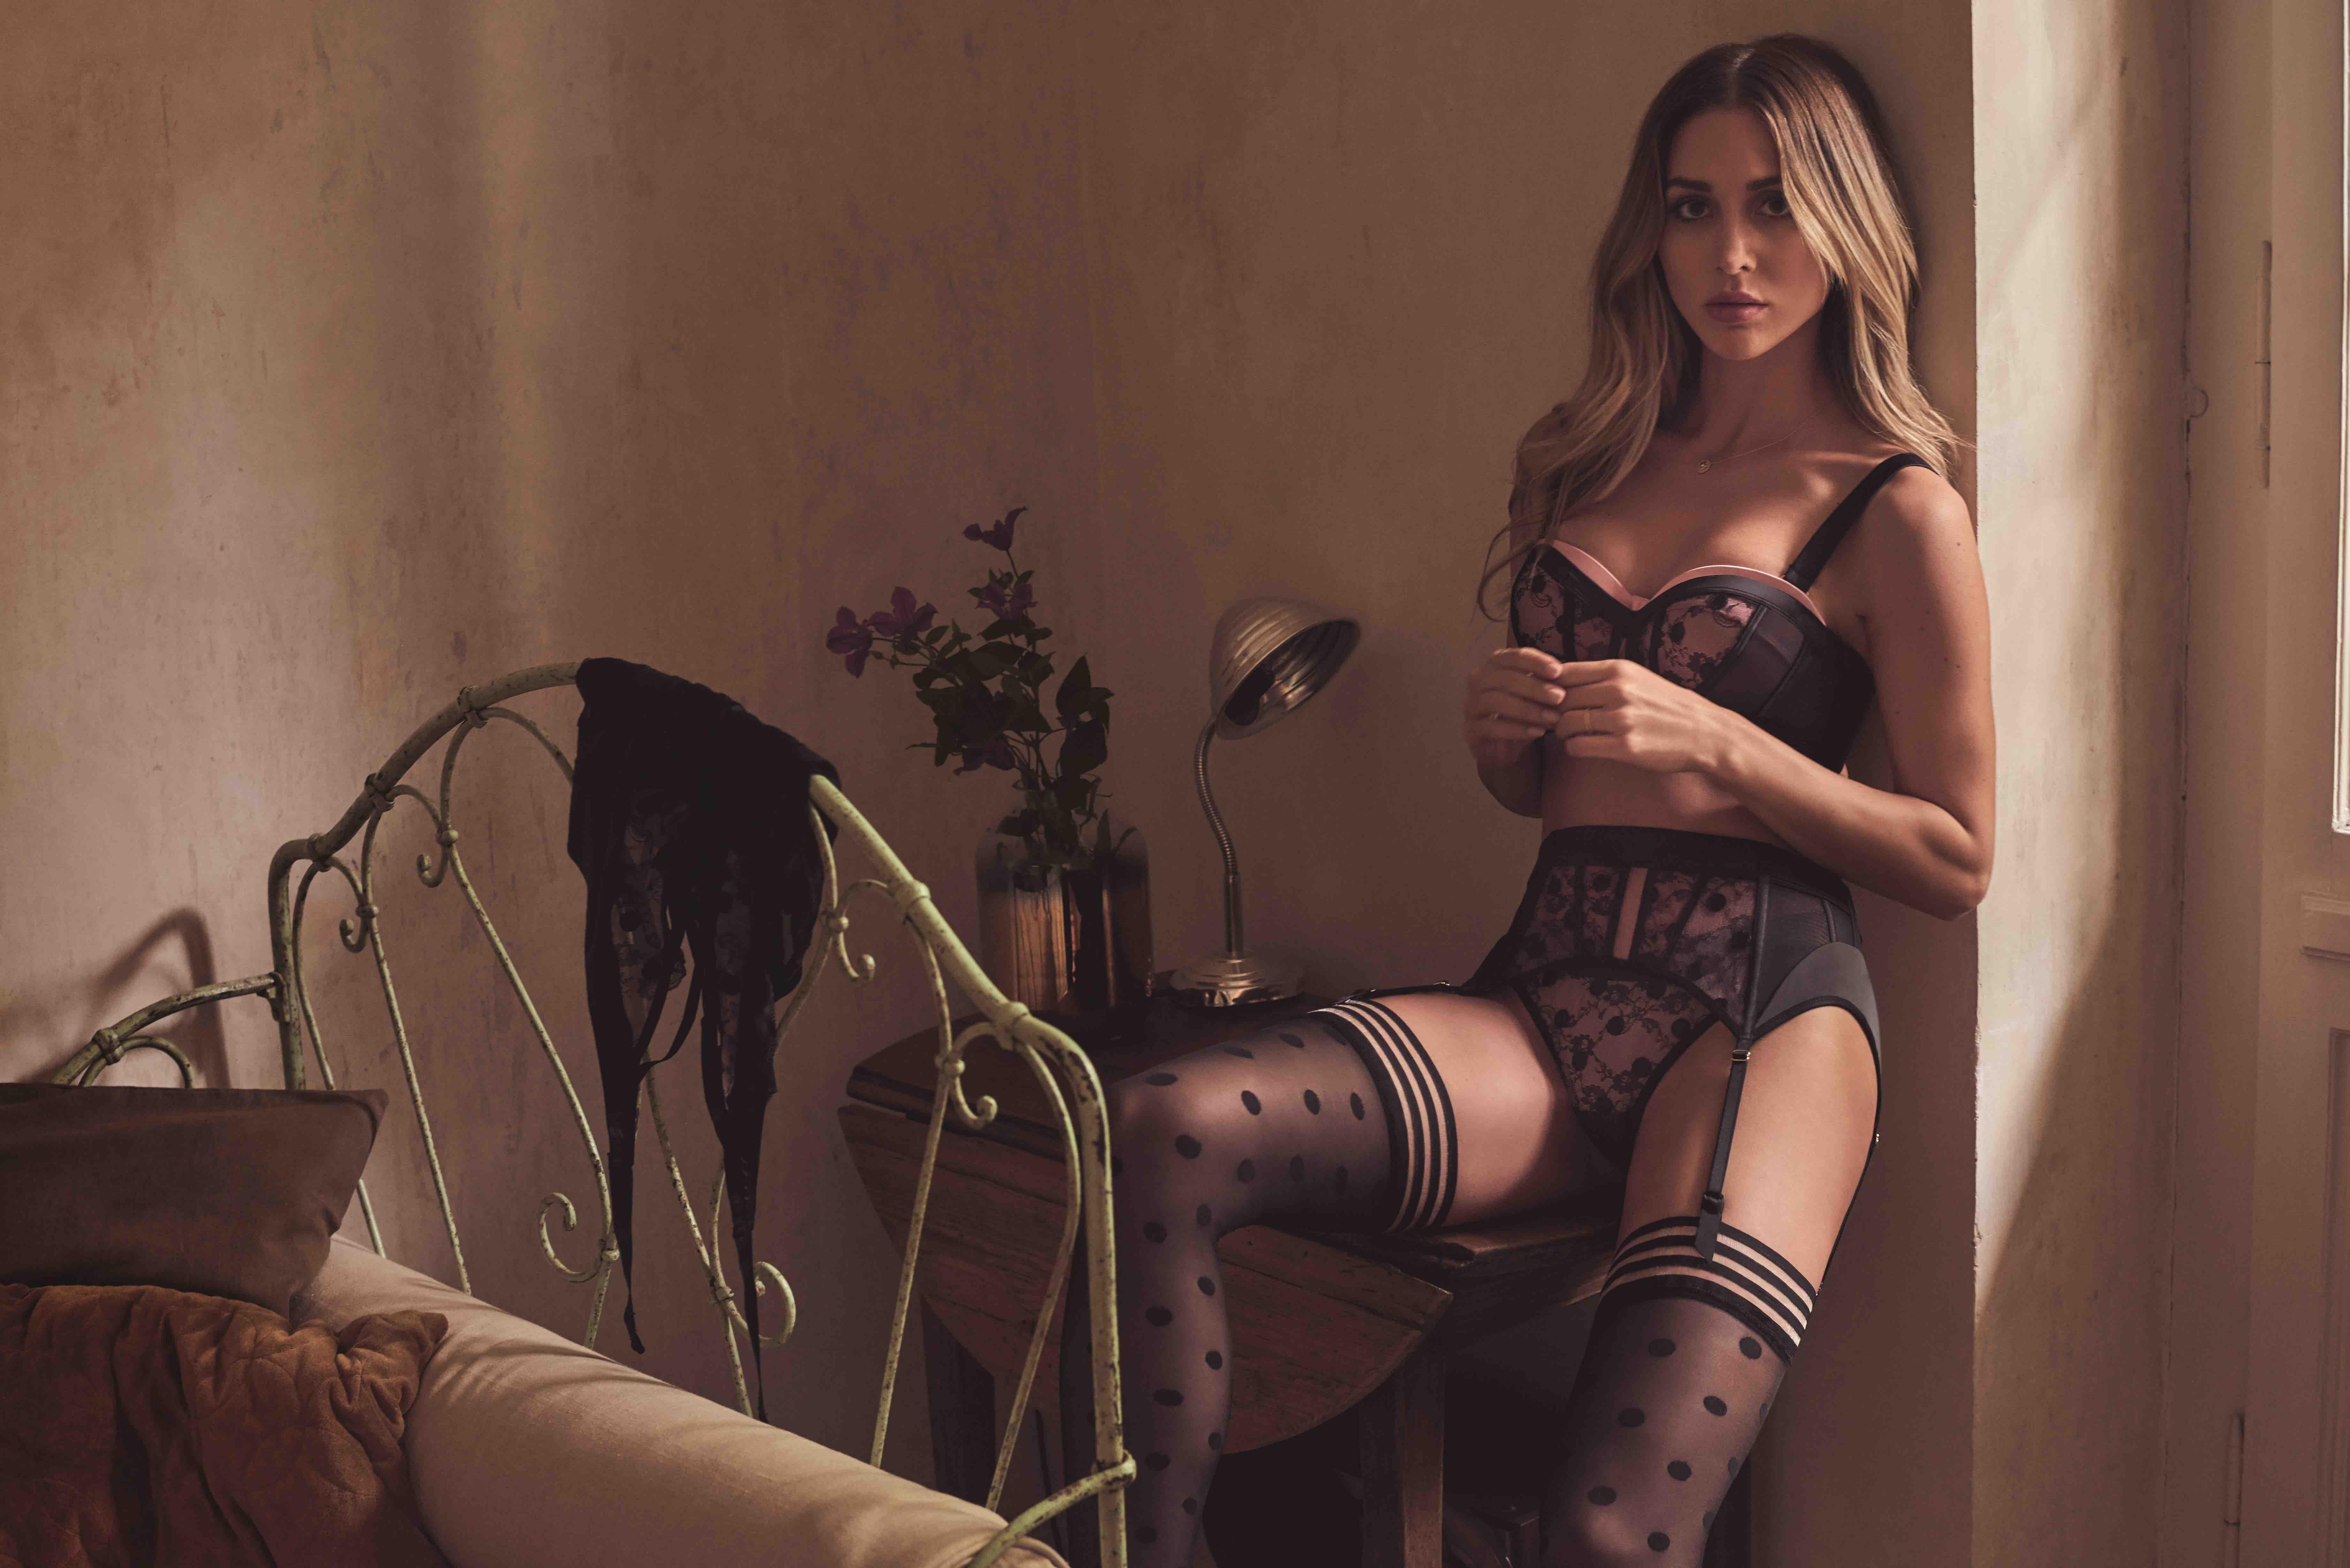 Ann-Kathrin Götze x Hunkemöller lingerie-